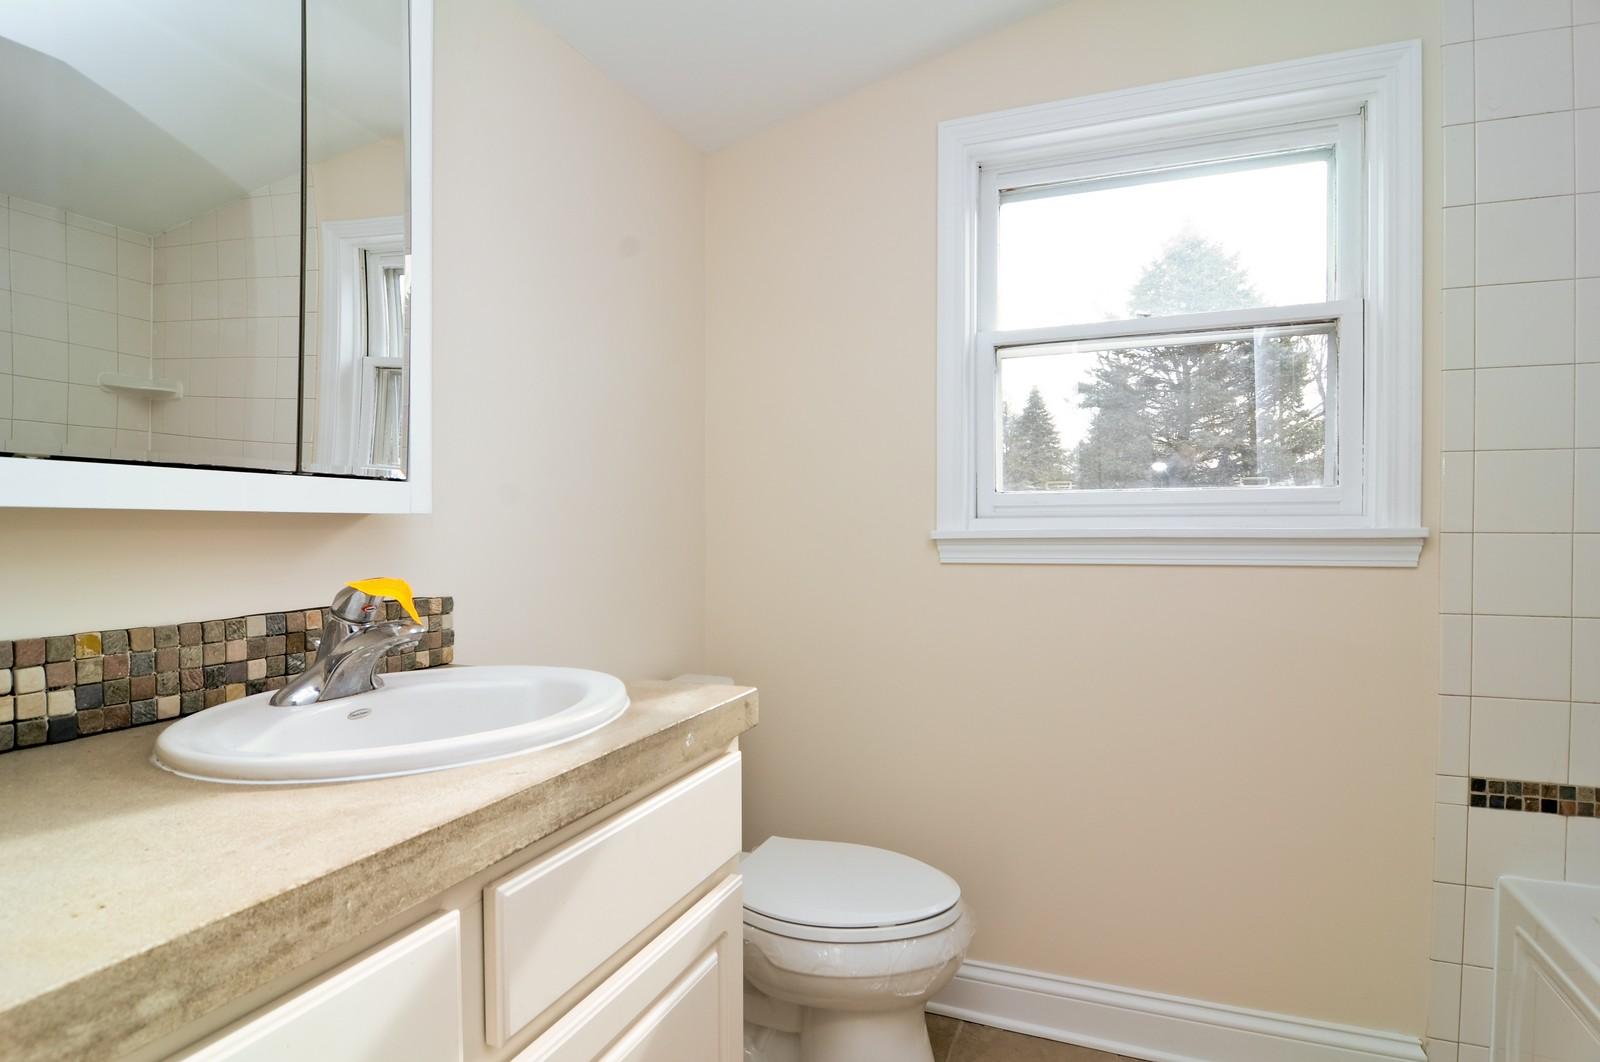 Real Estate Photography - 109 N River Rd, Fox River Grove, IL, 60021 - Bathroom